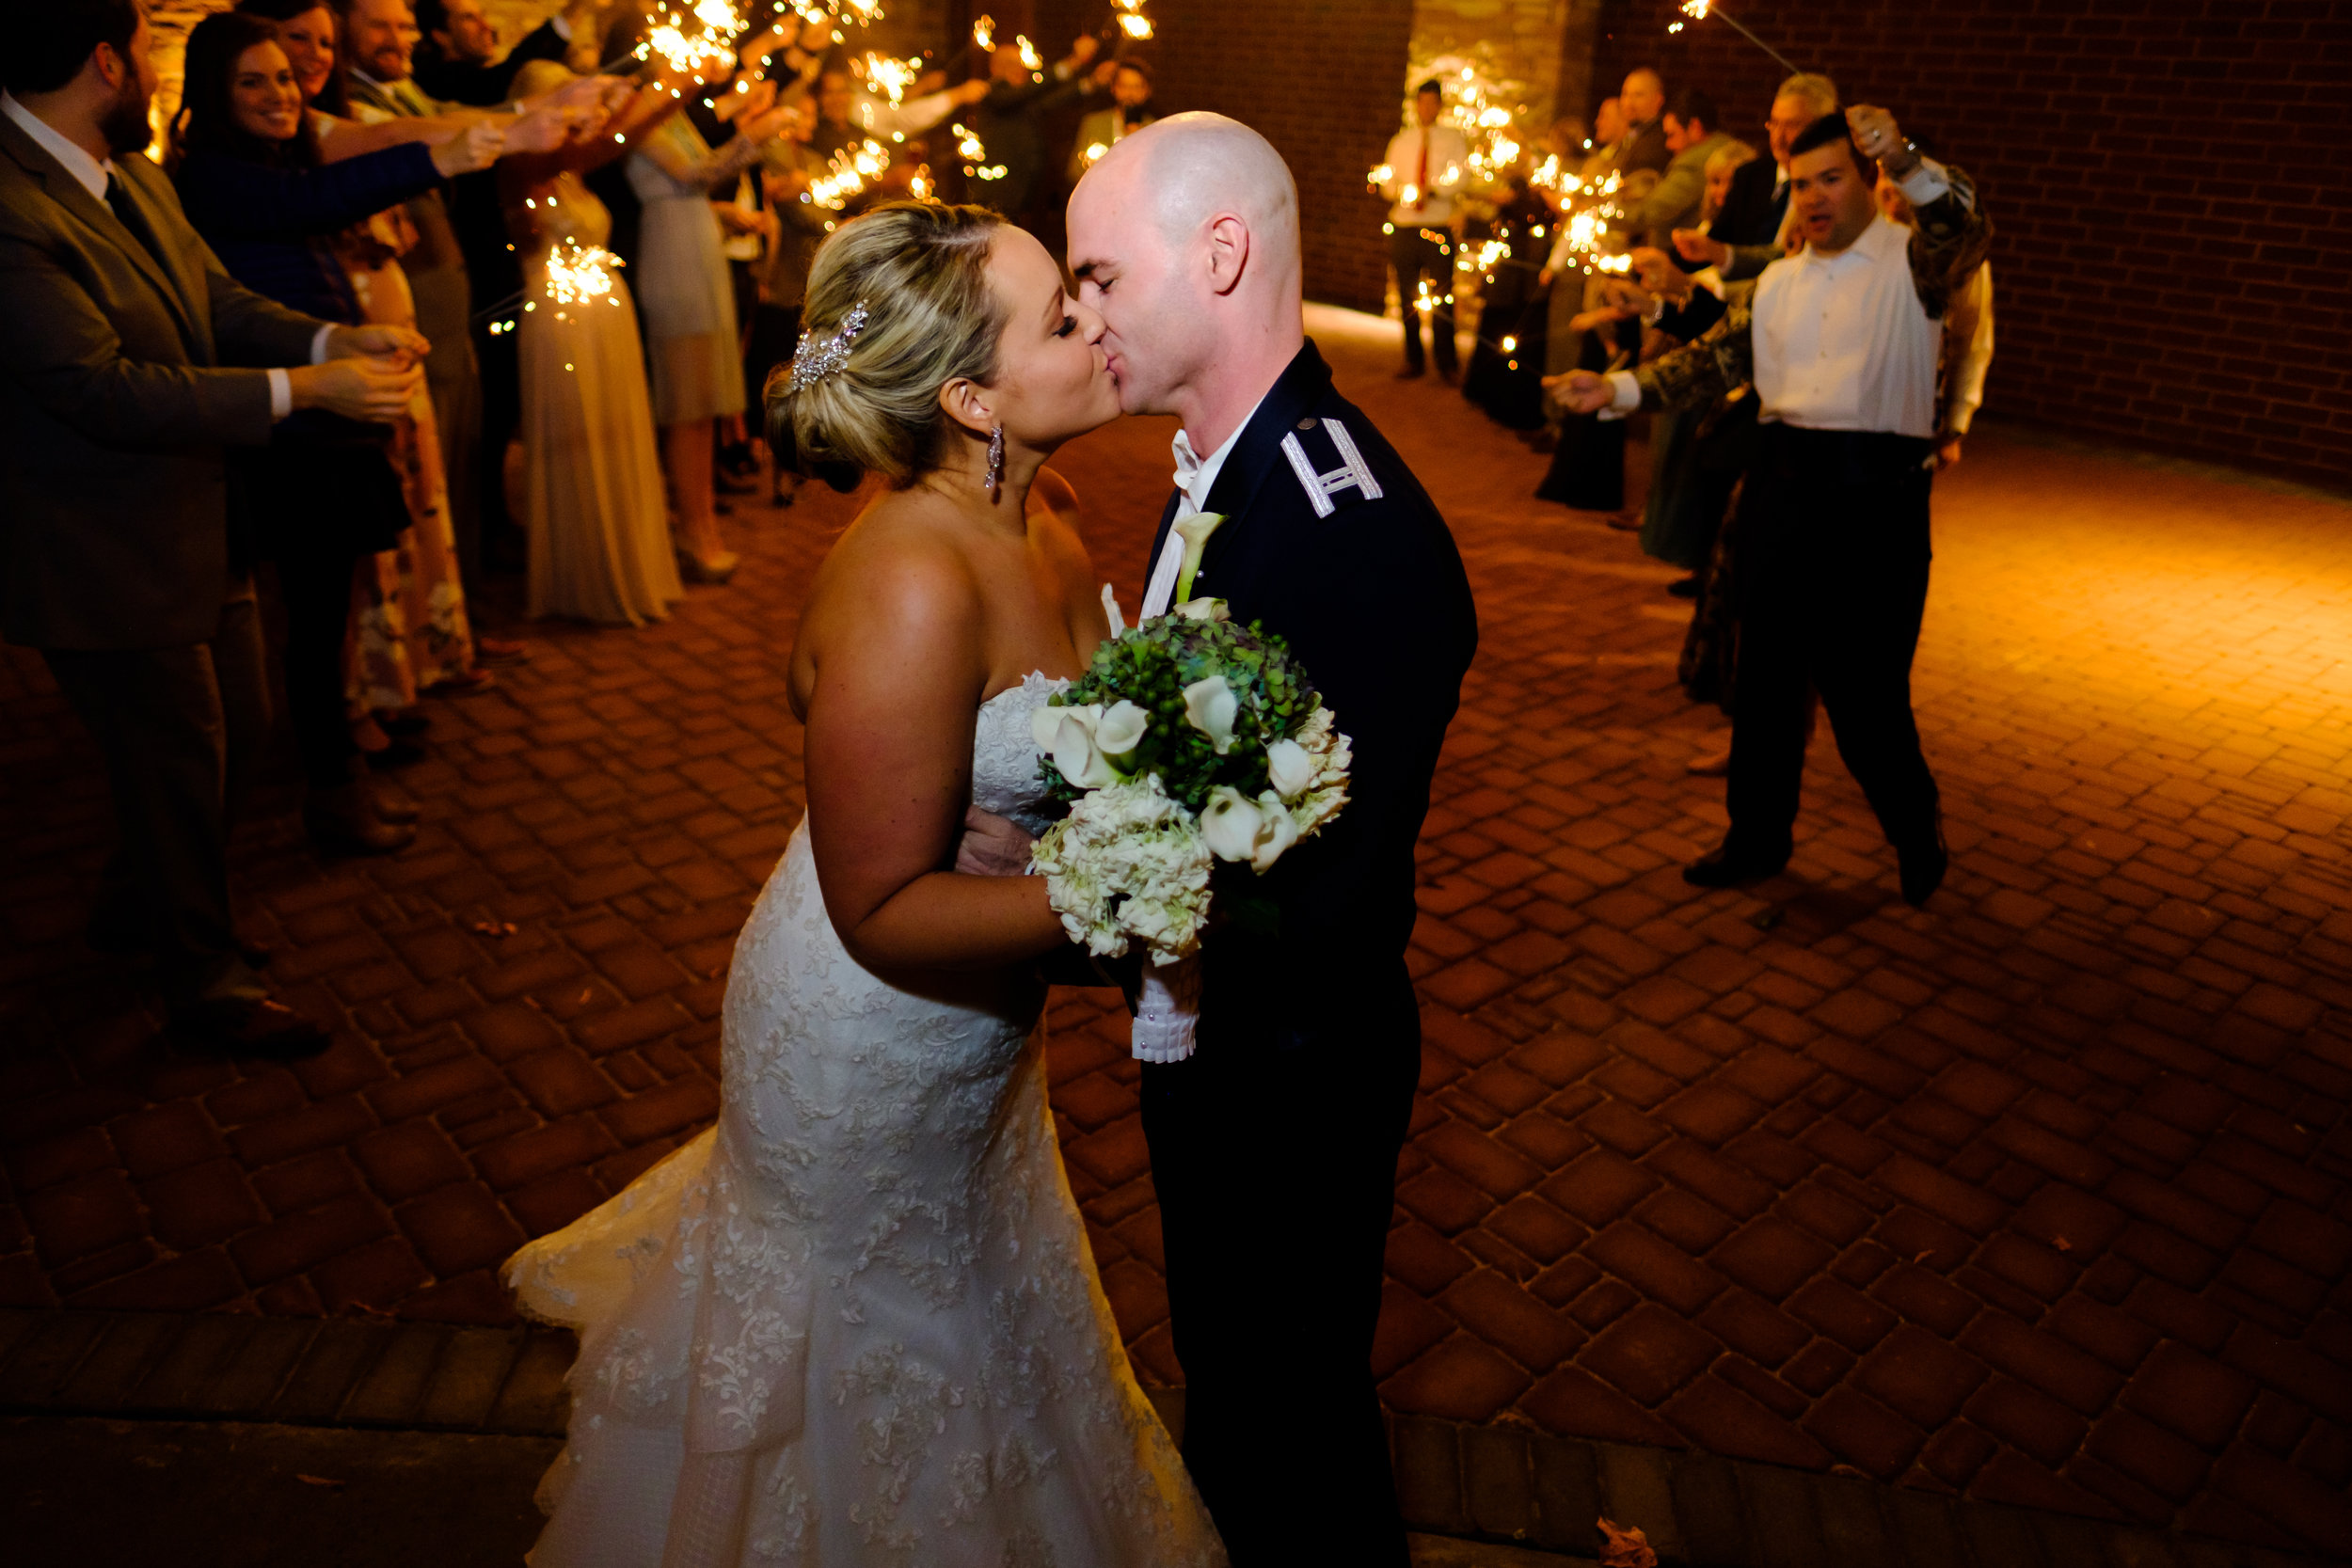 #meadowviewconventioncenter #militarywedding #sparklerexit #wedding #kingsporttn #magmod